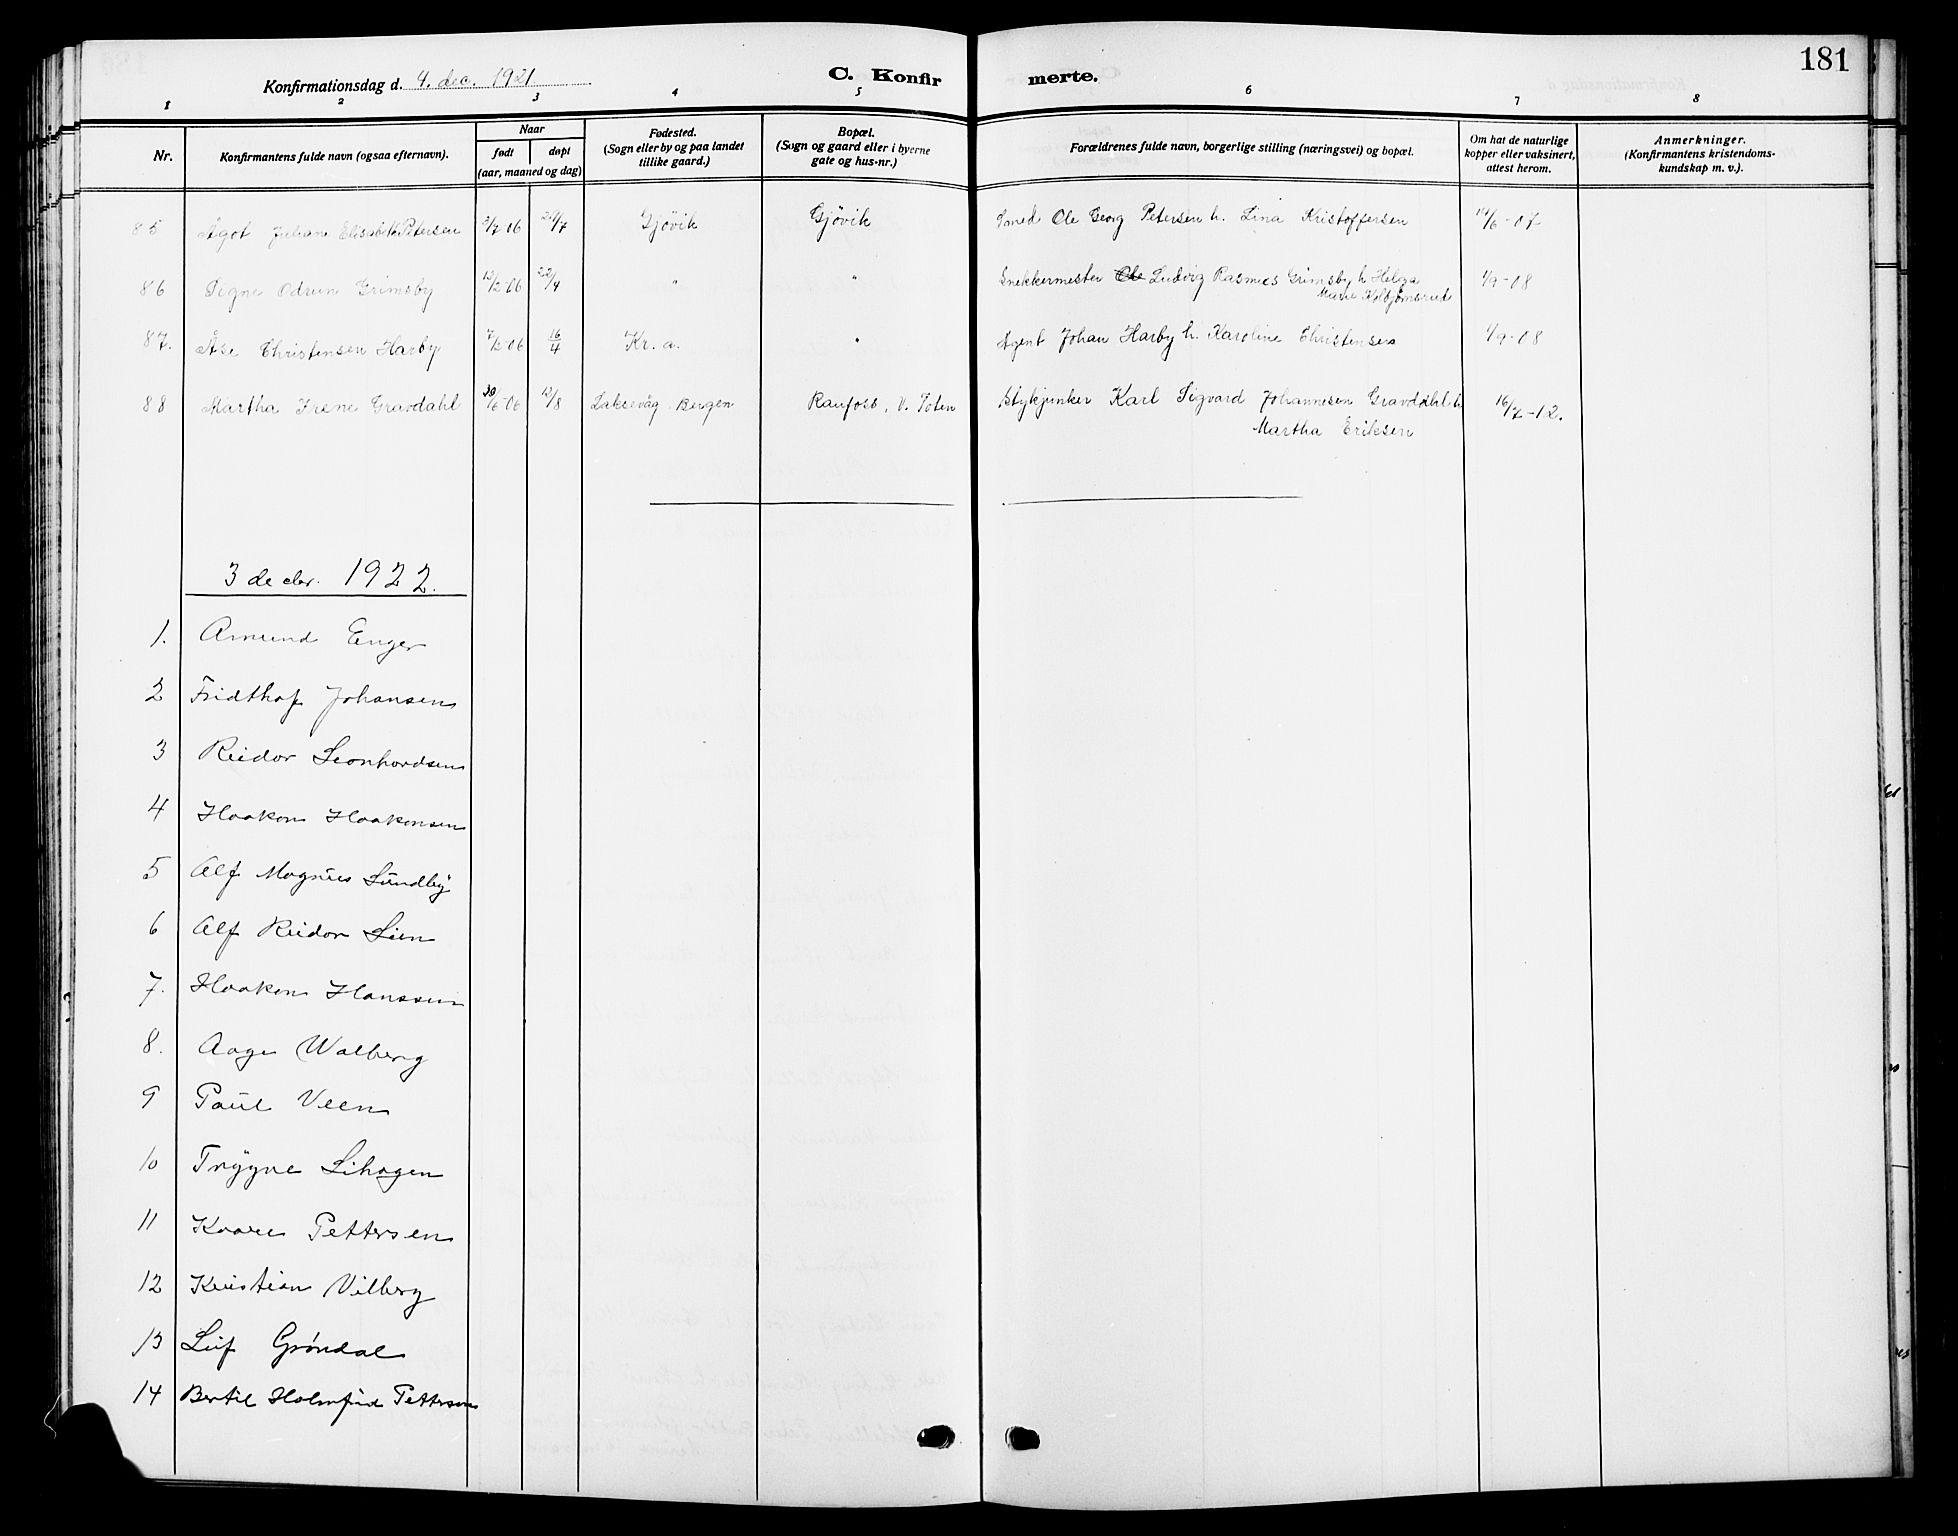 SAH, Vardal prestekontor, H/Ha/Hab/L0014: Klokkerbok nr. 14, 1911-1922, s. 181